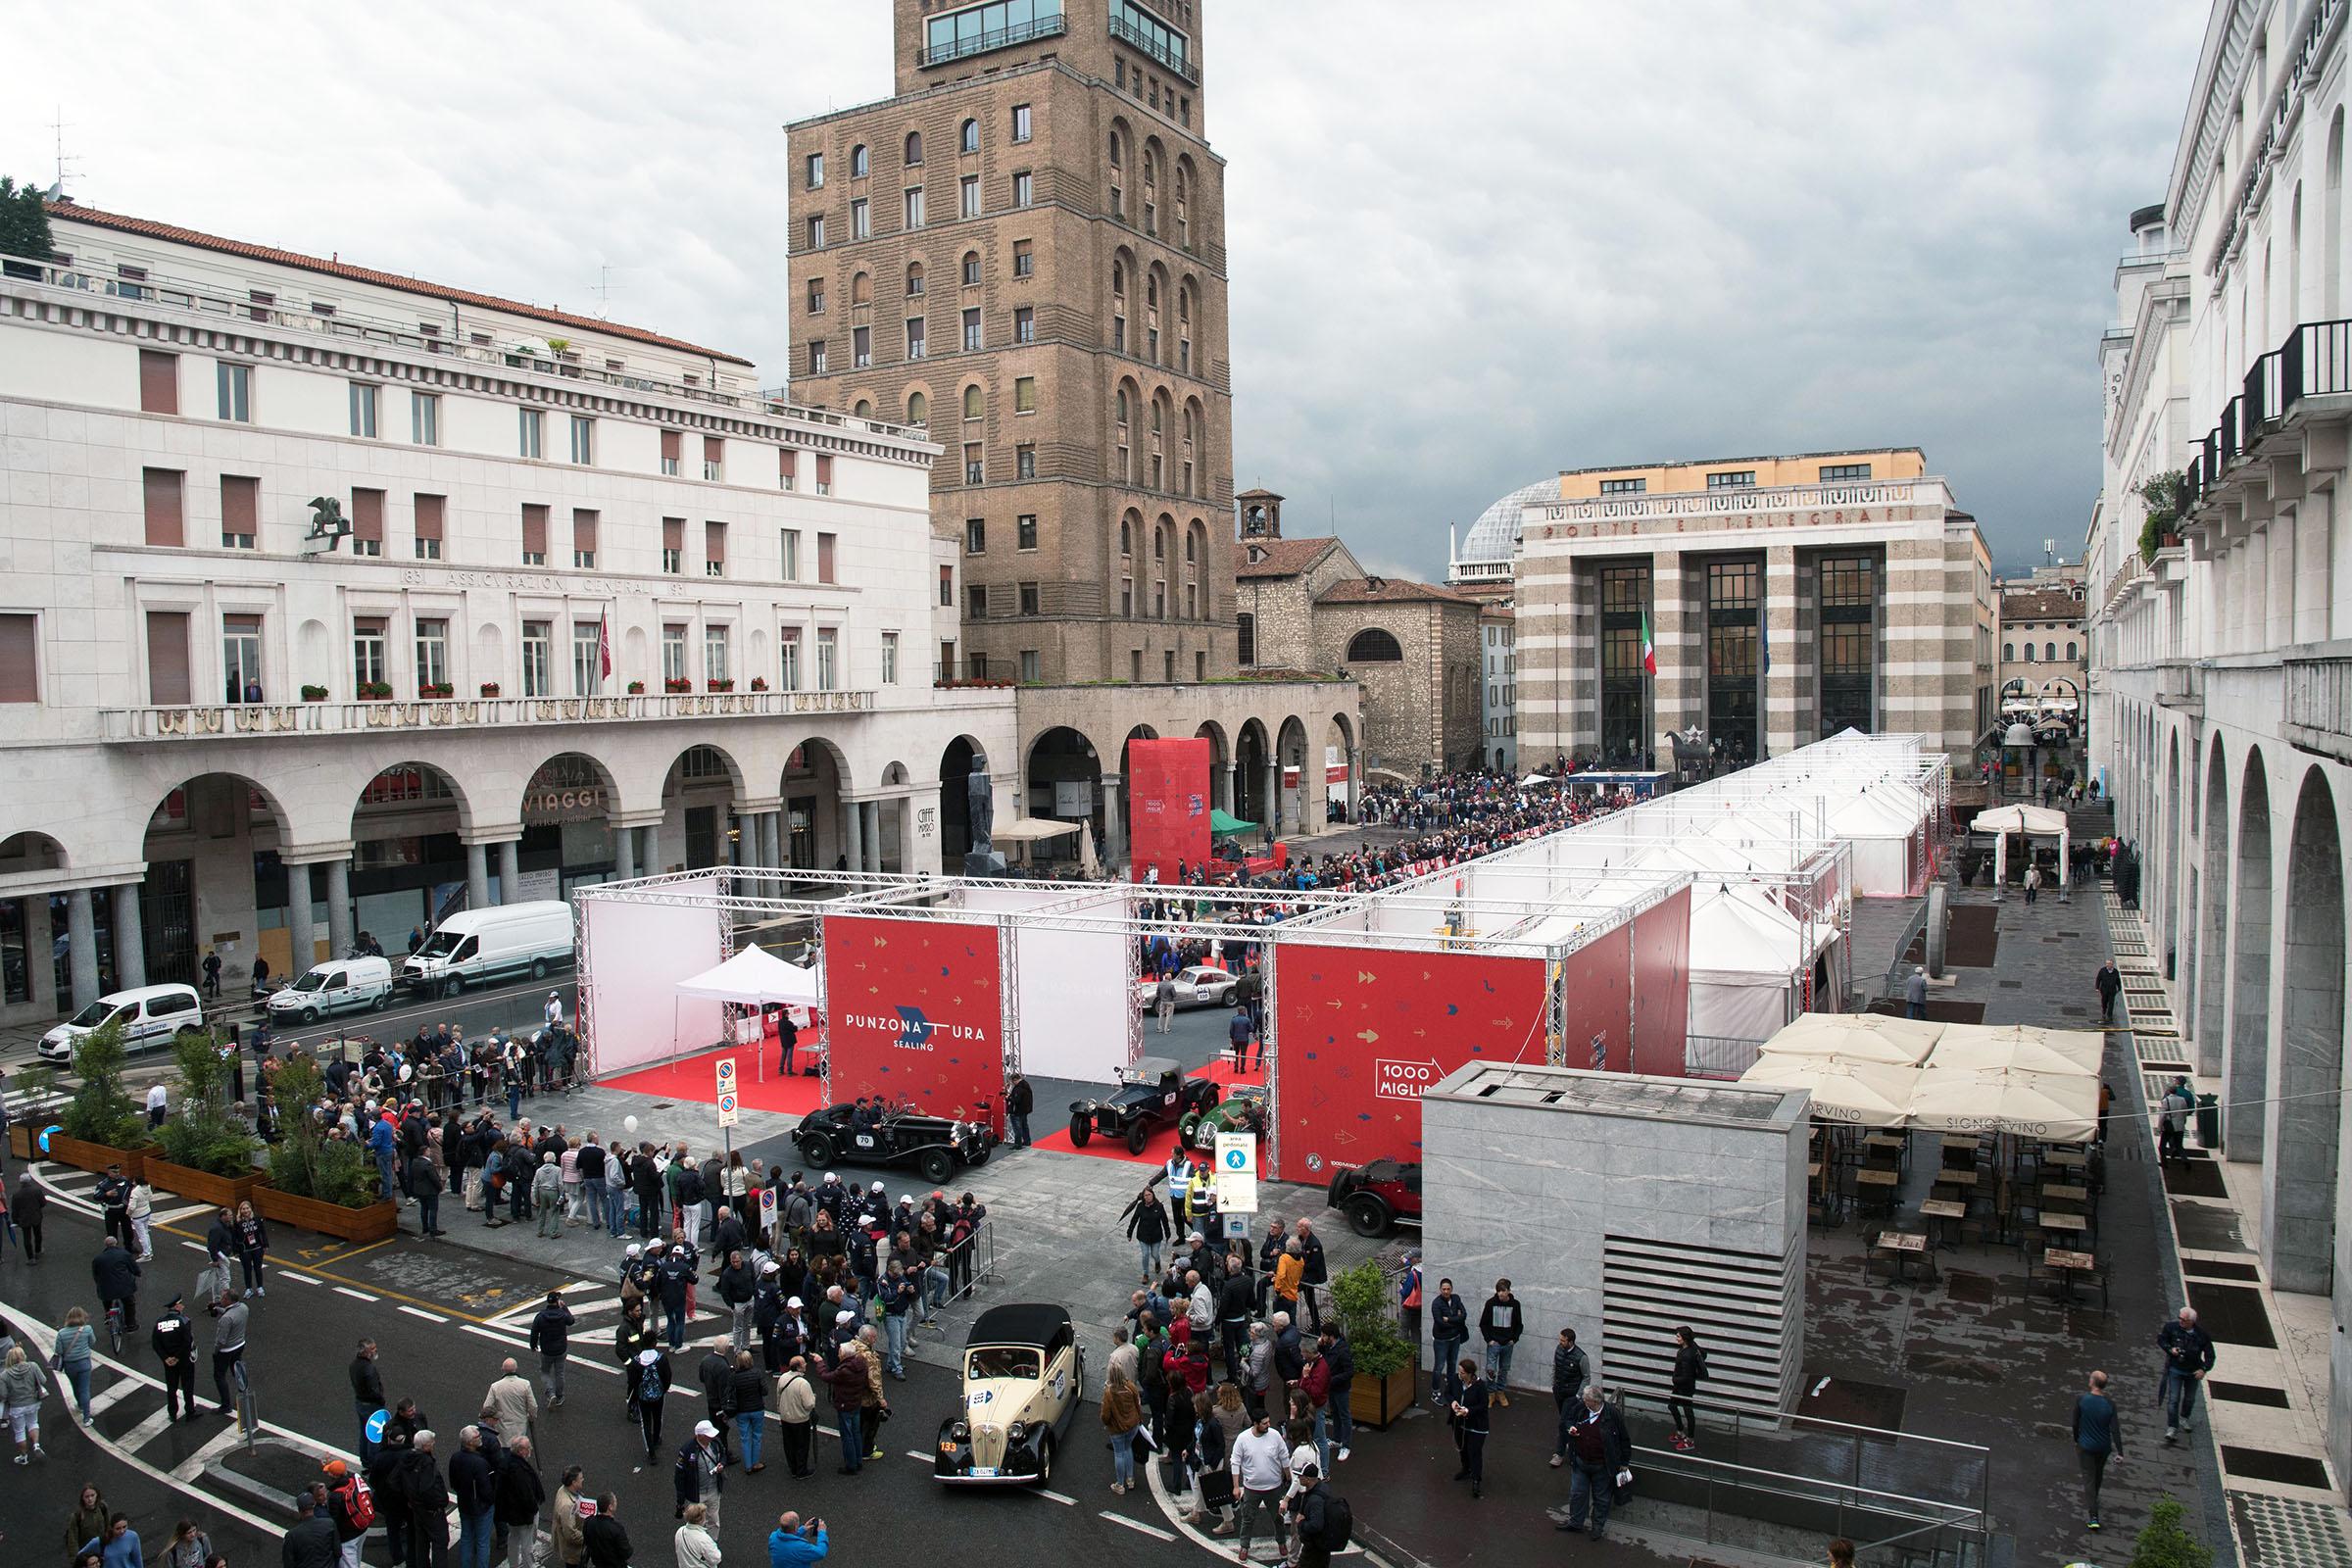 Punzonatura - Sealing of the cars 2018